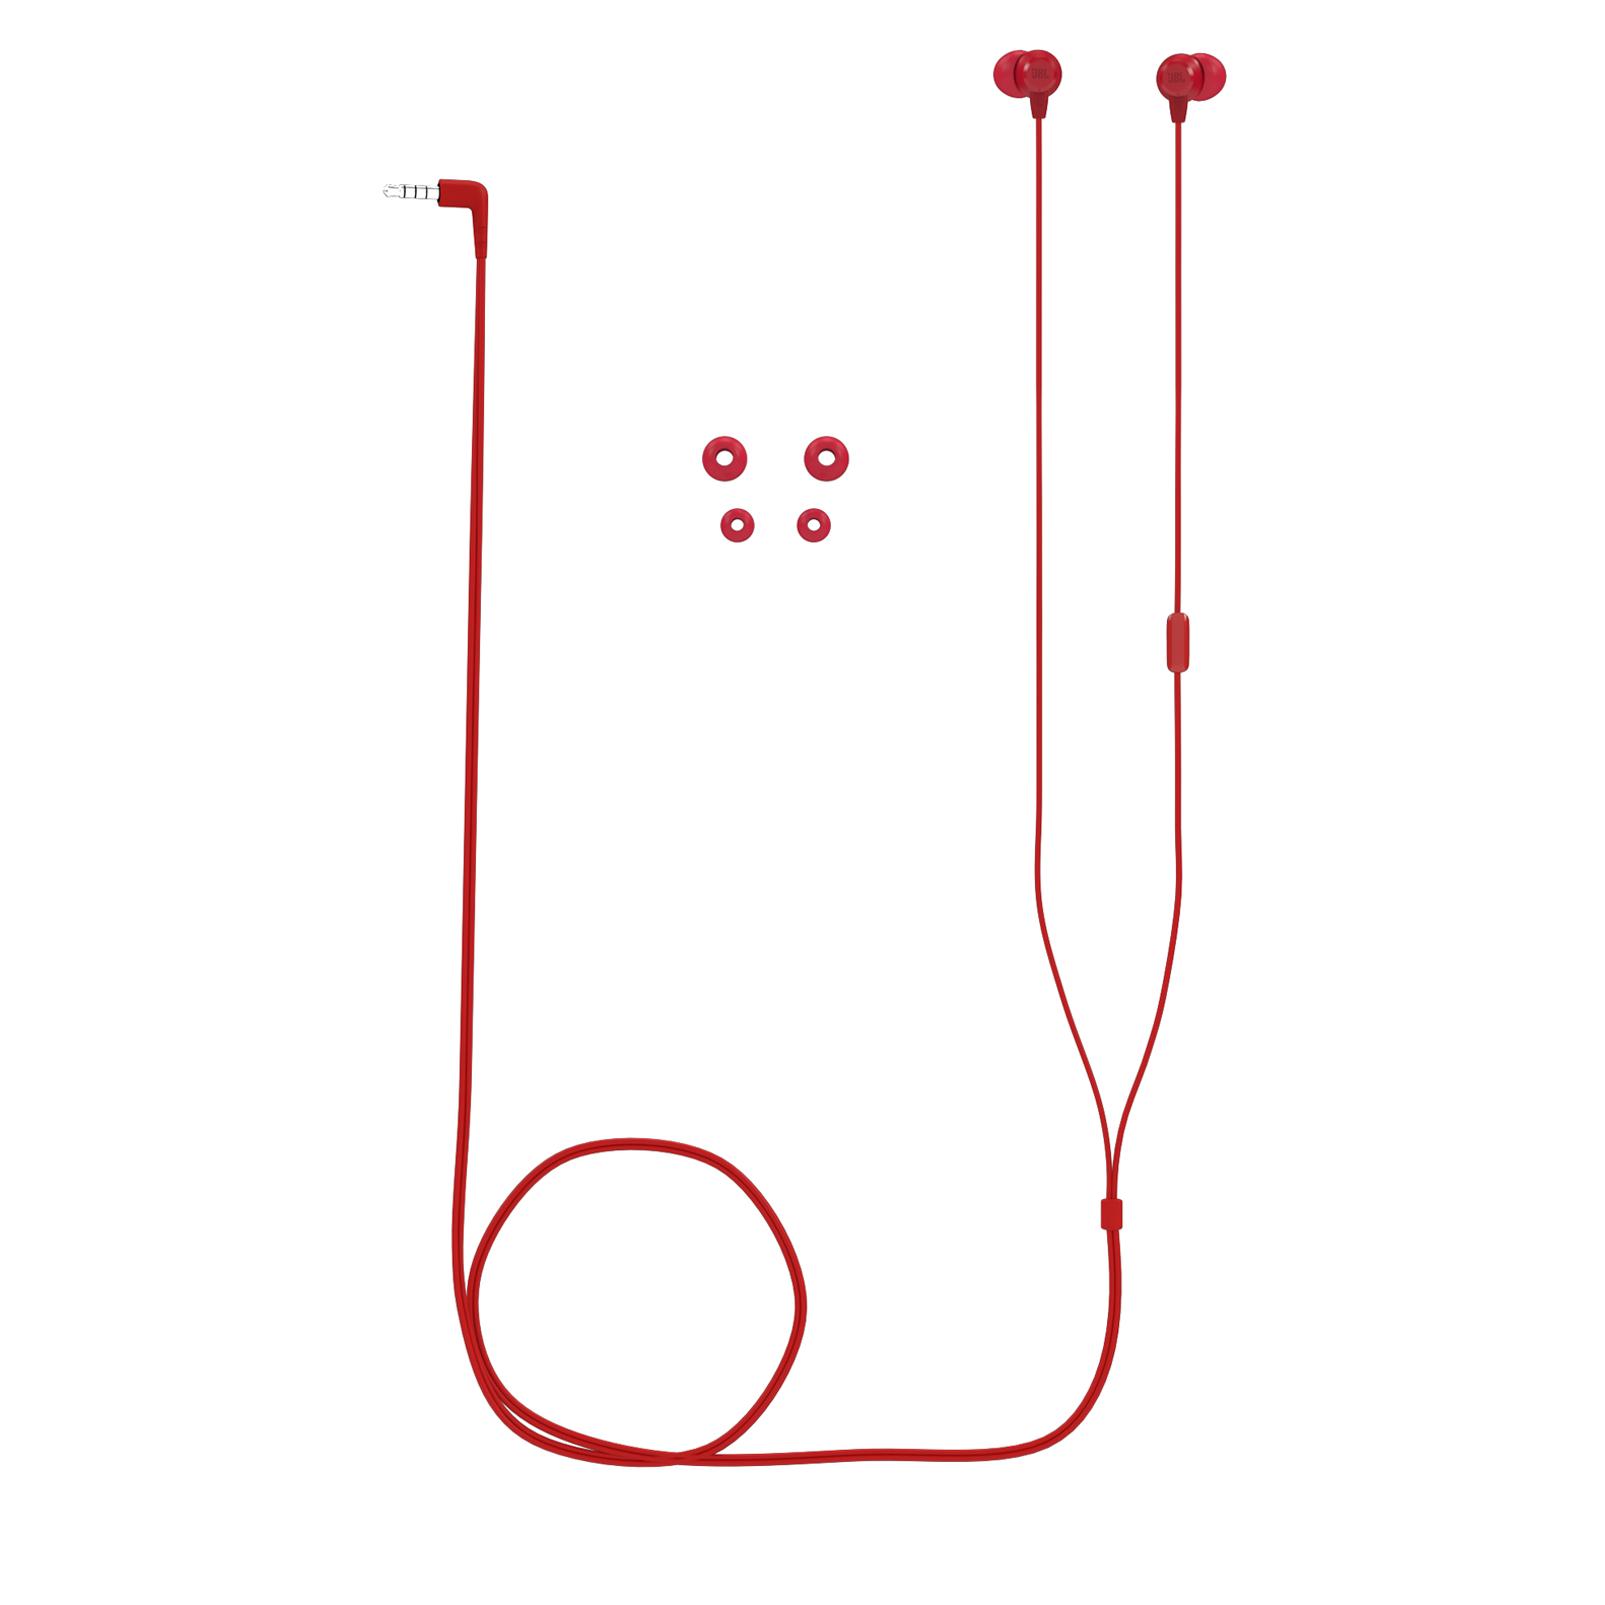 JBL T50HI - Red - In-Ear Headphones - Detailshot 3